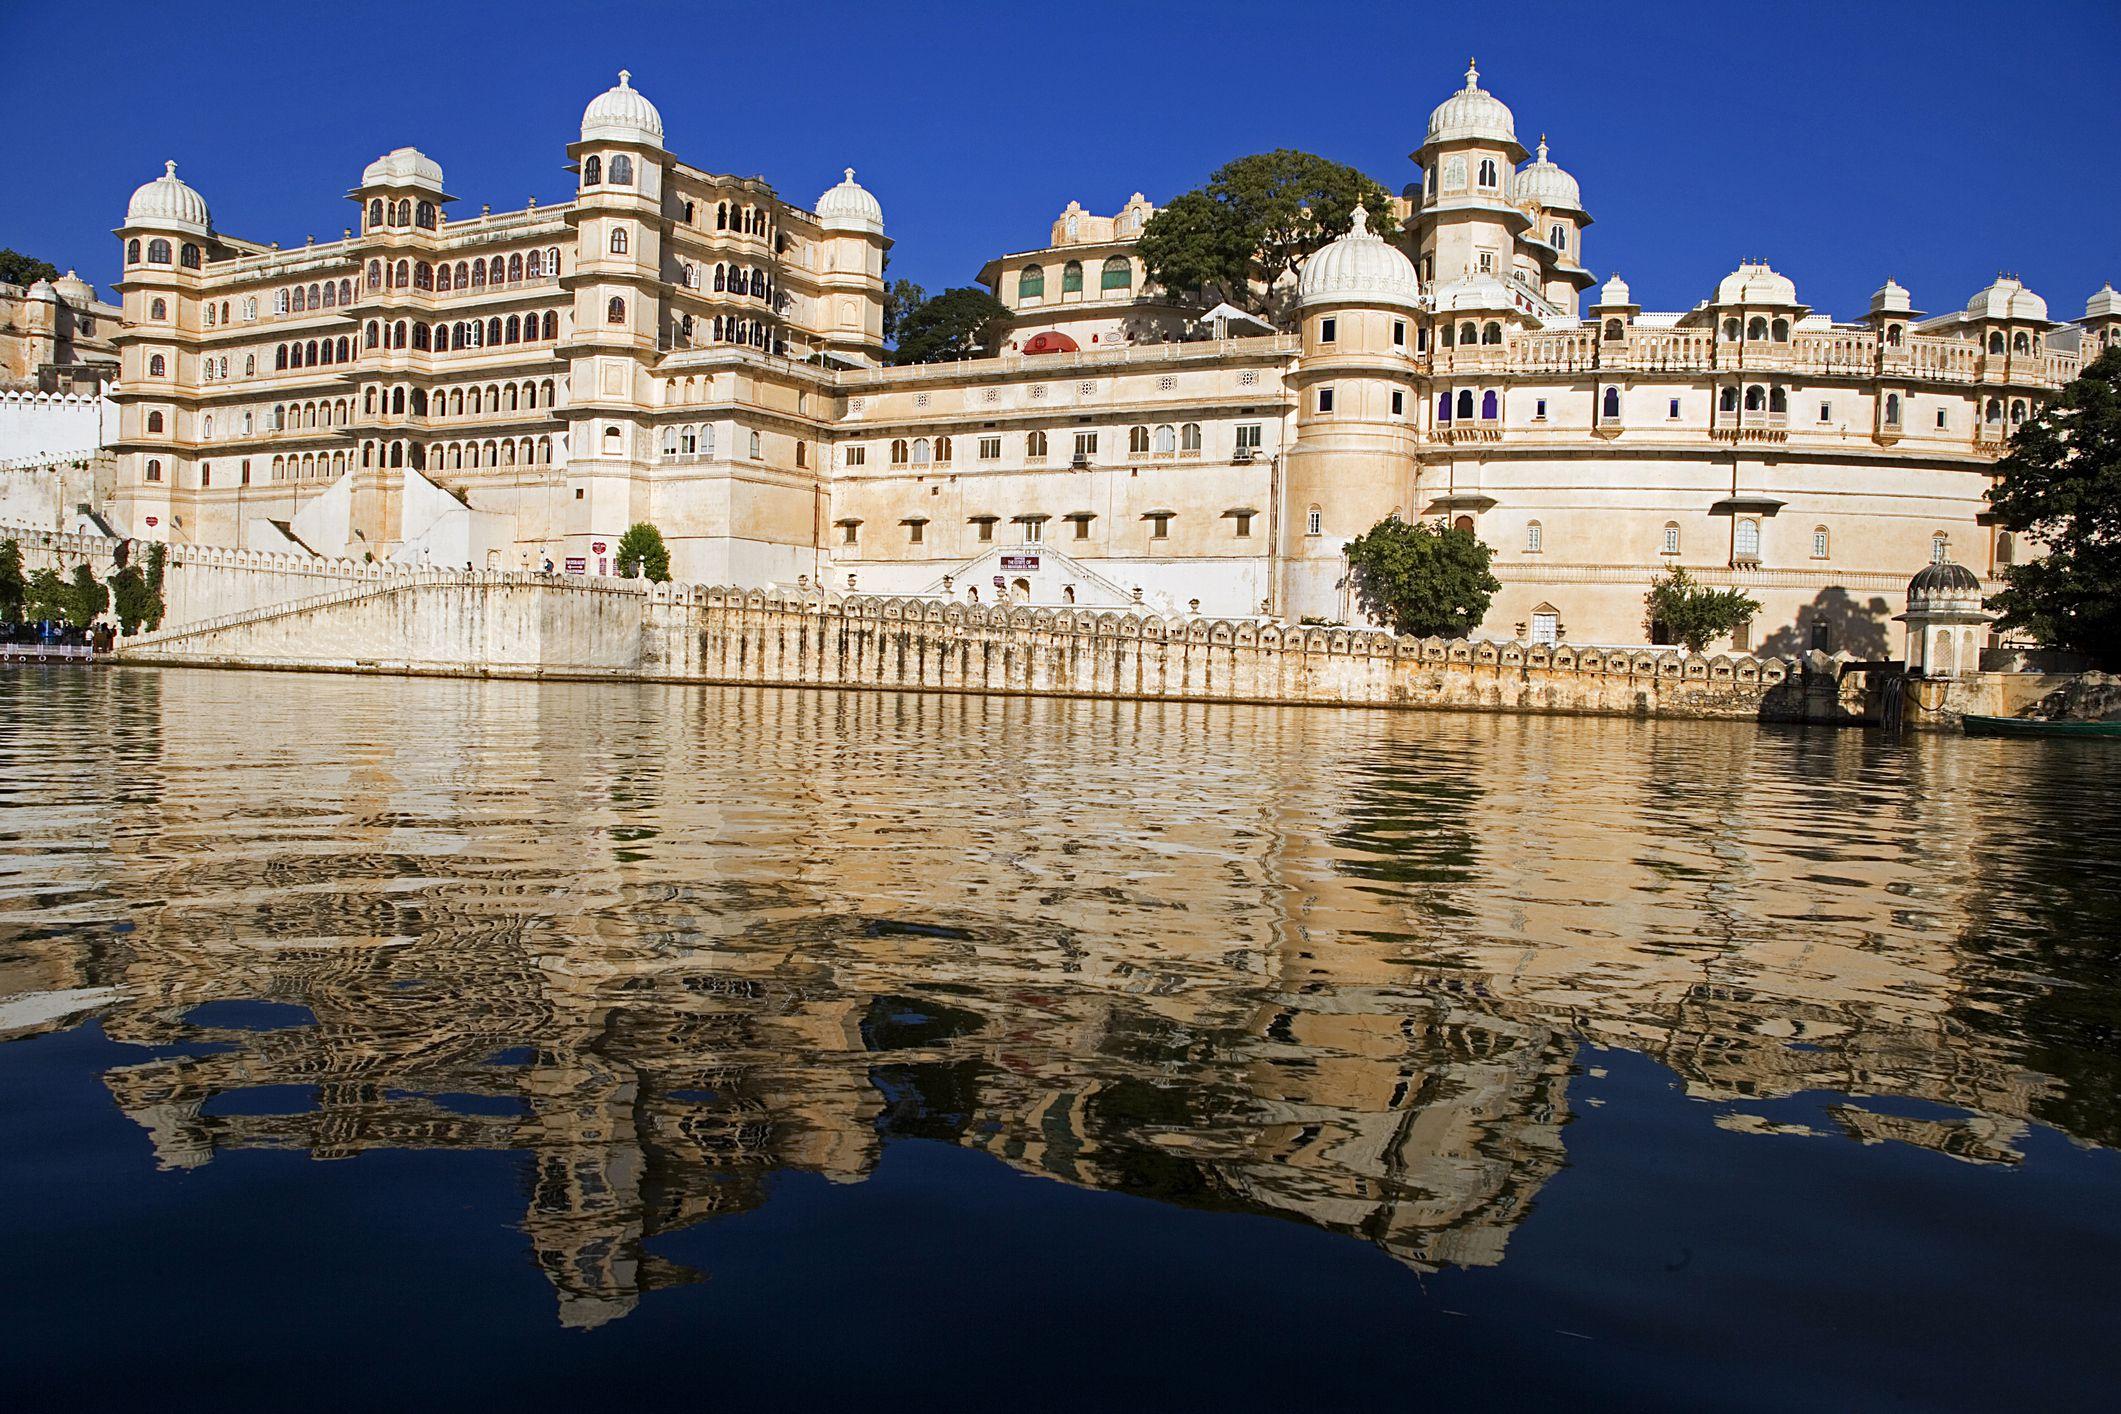 City Palace viewed from Lake Pichola, Udaipur, Rajasthan, India